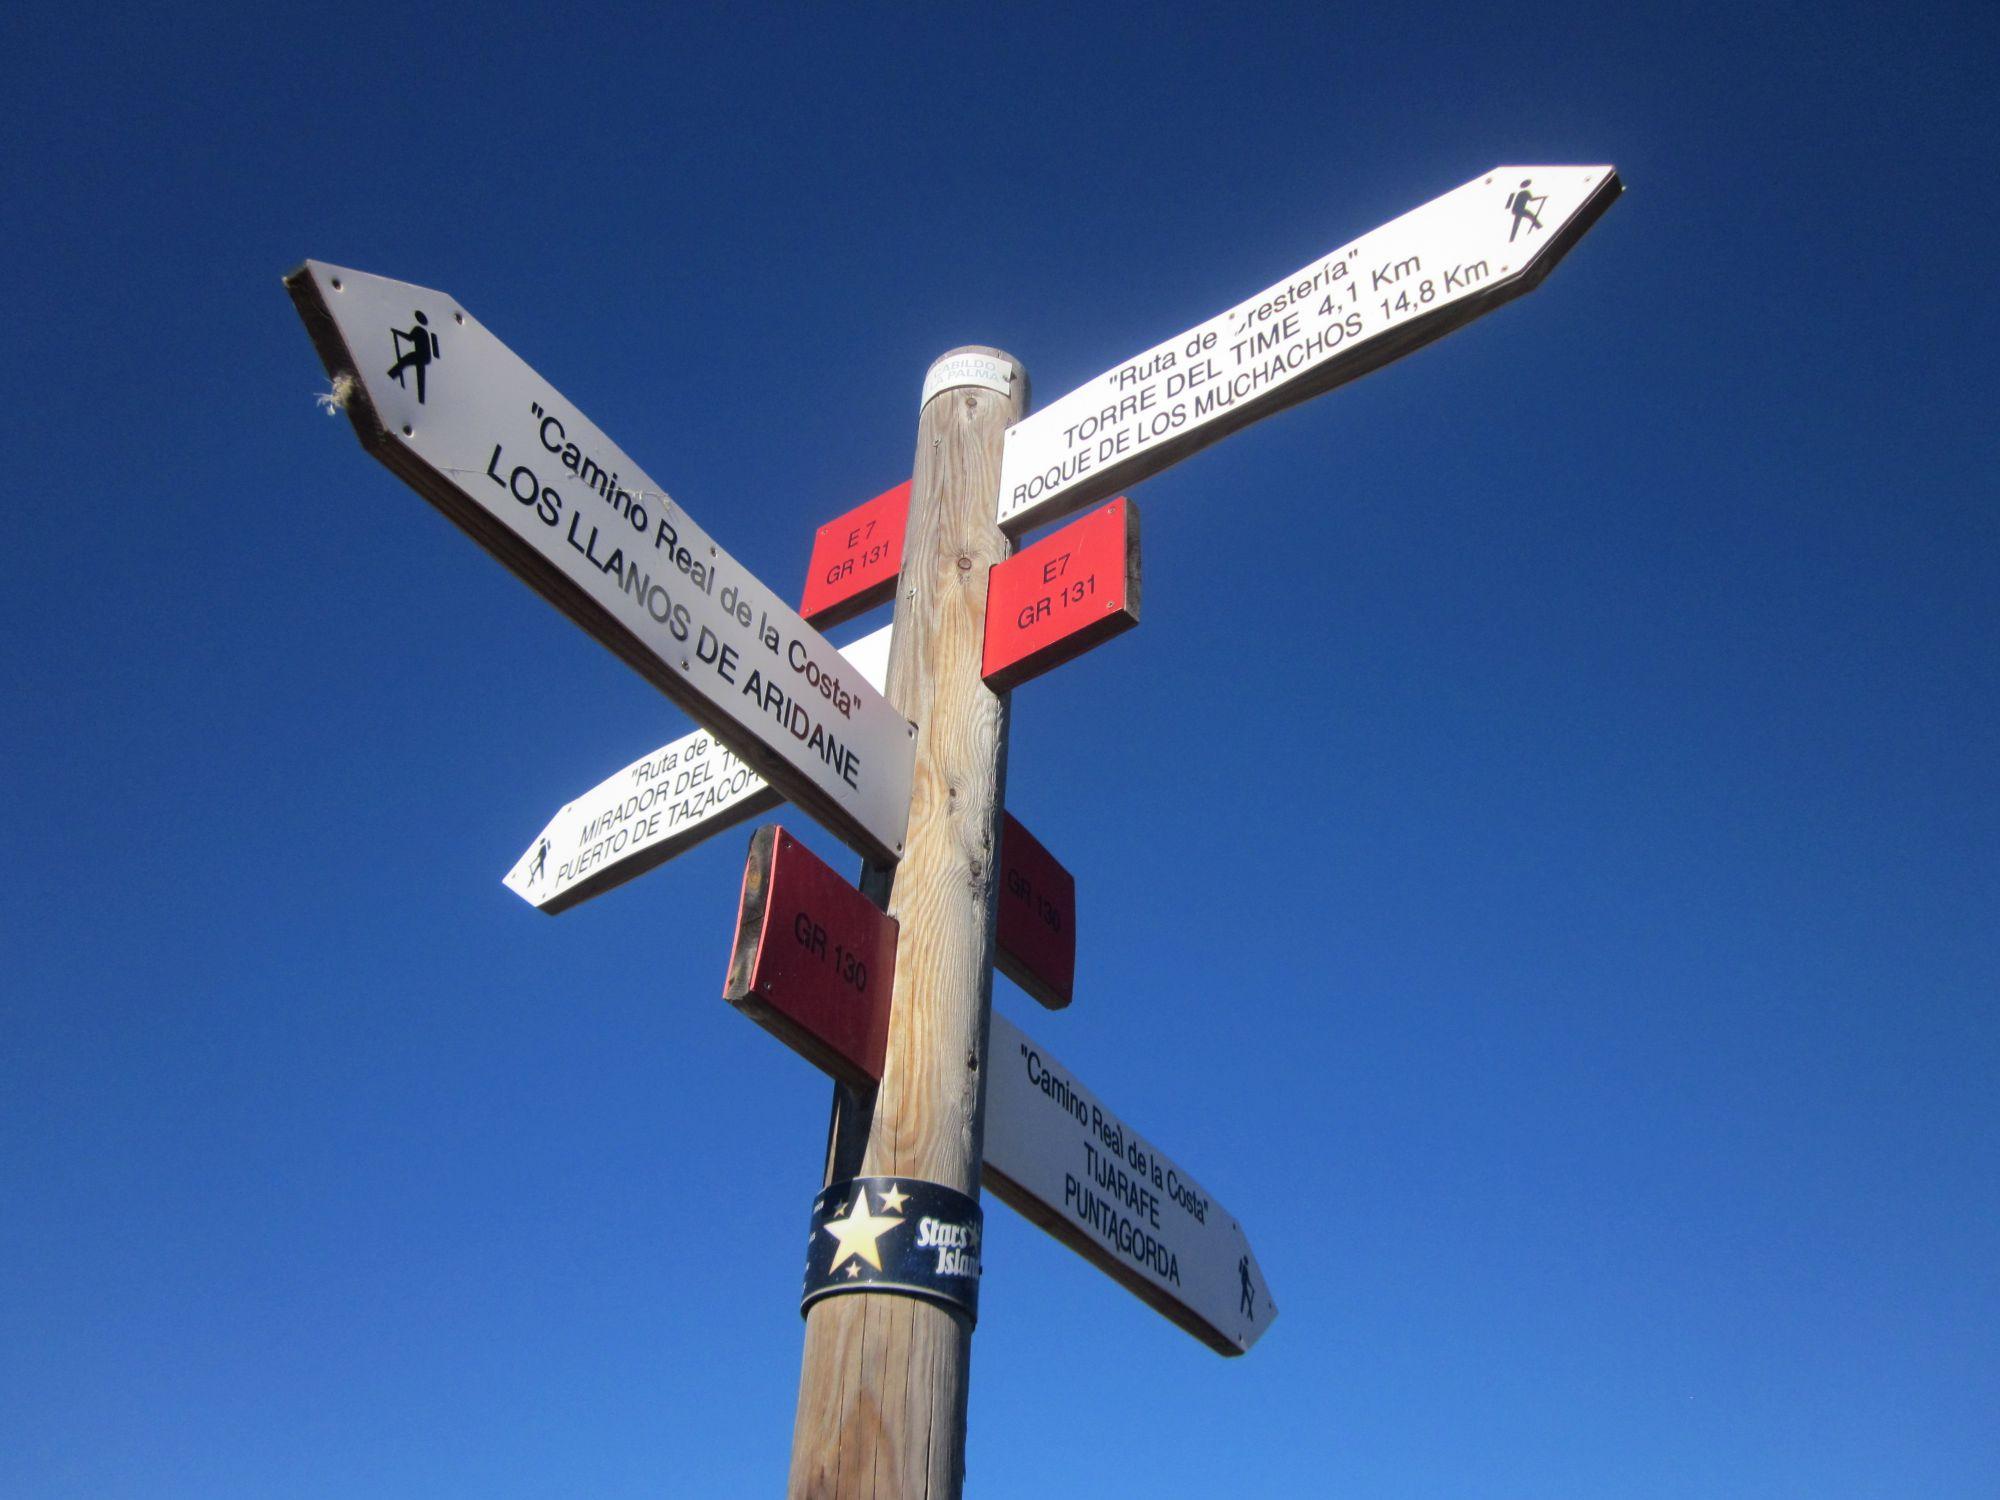 Walking routes on La Palma